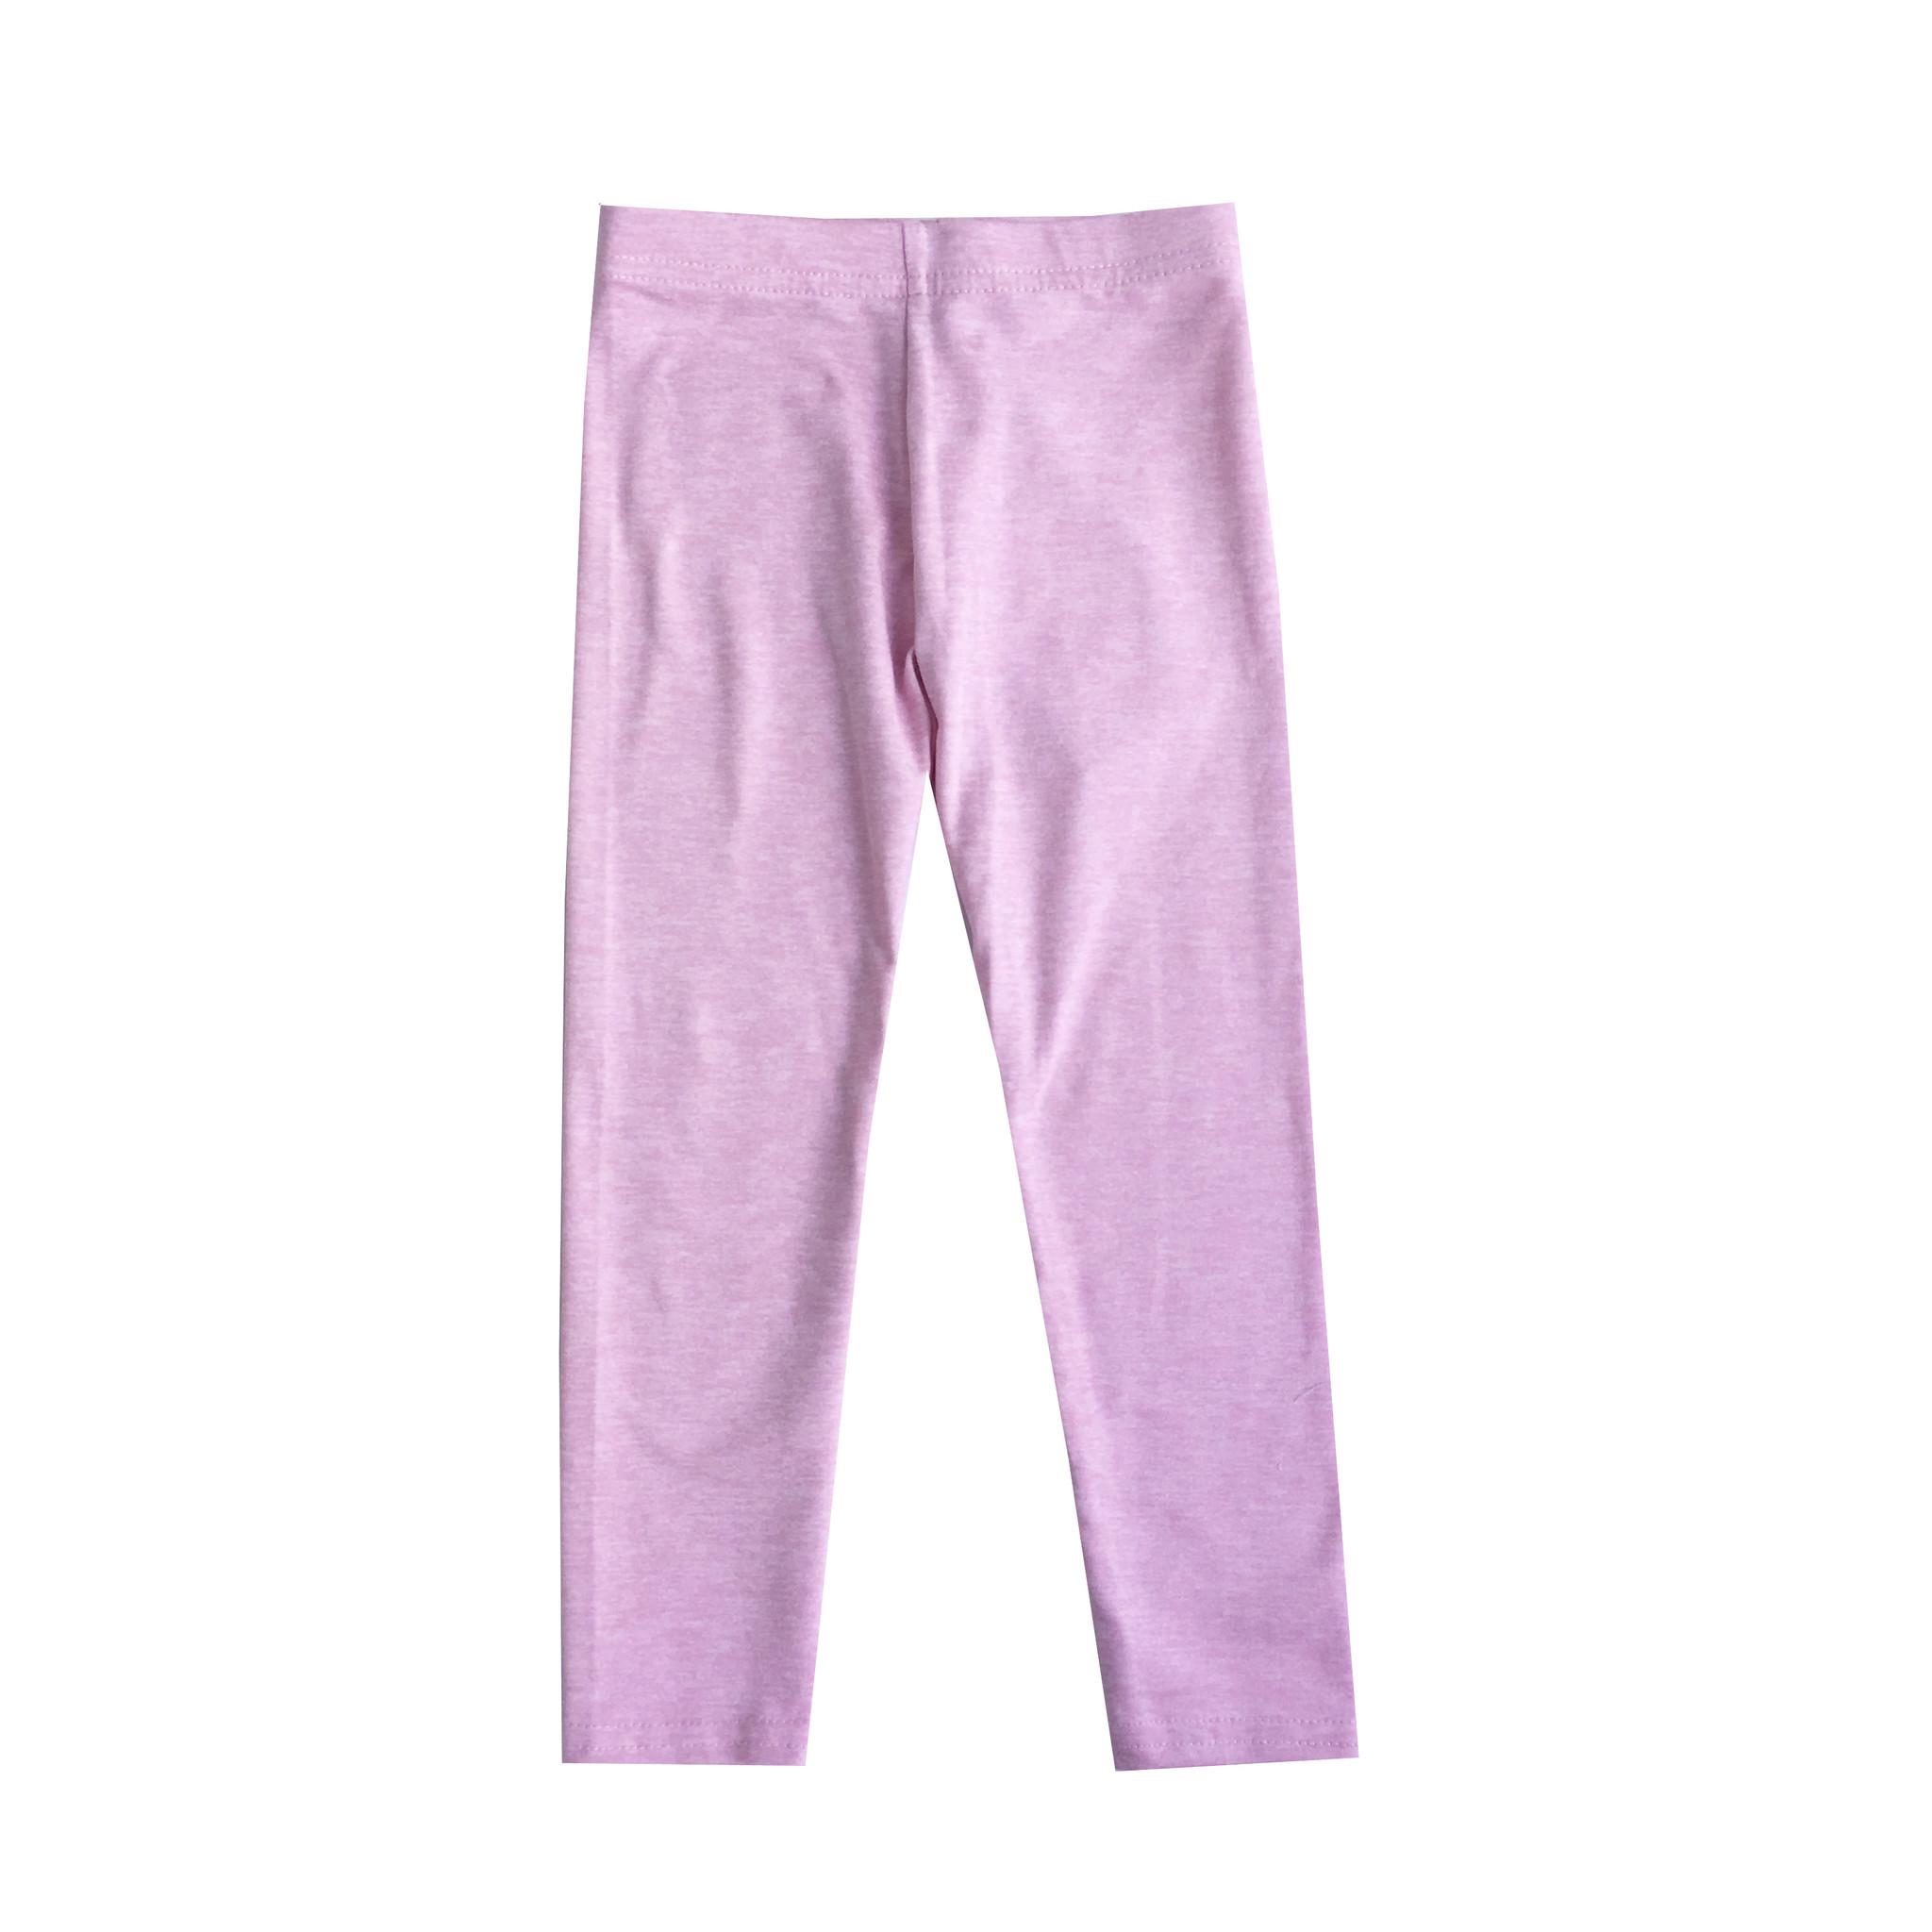 Dori Lt. Pink/White Infant Heathered Legging